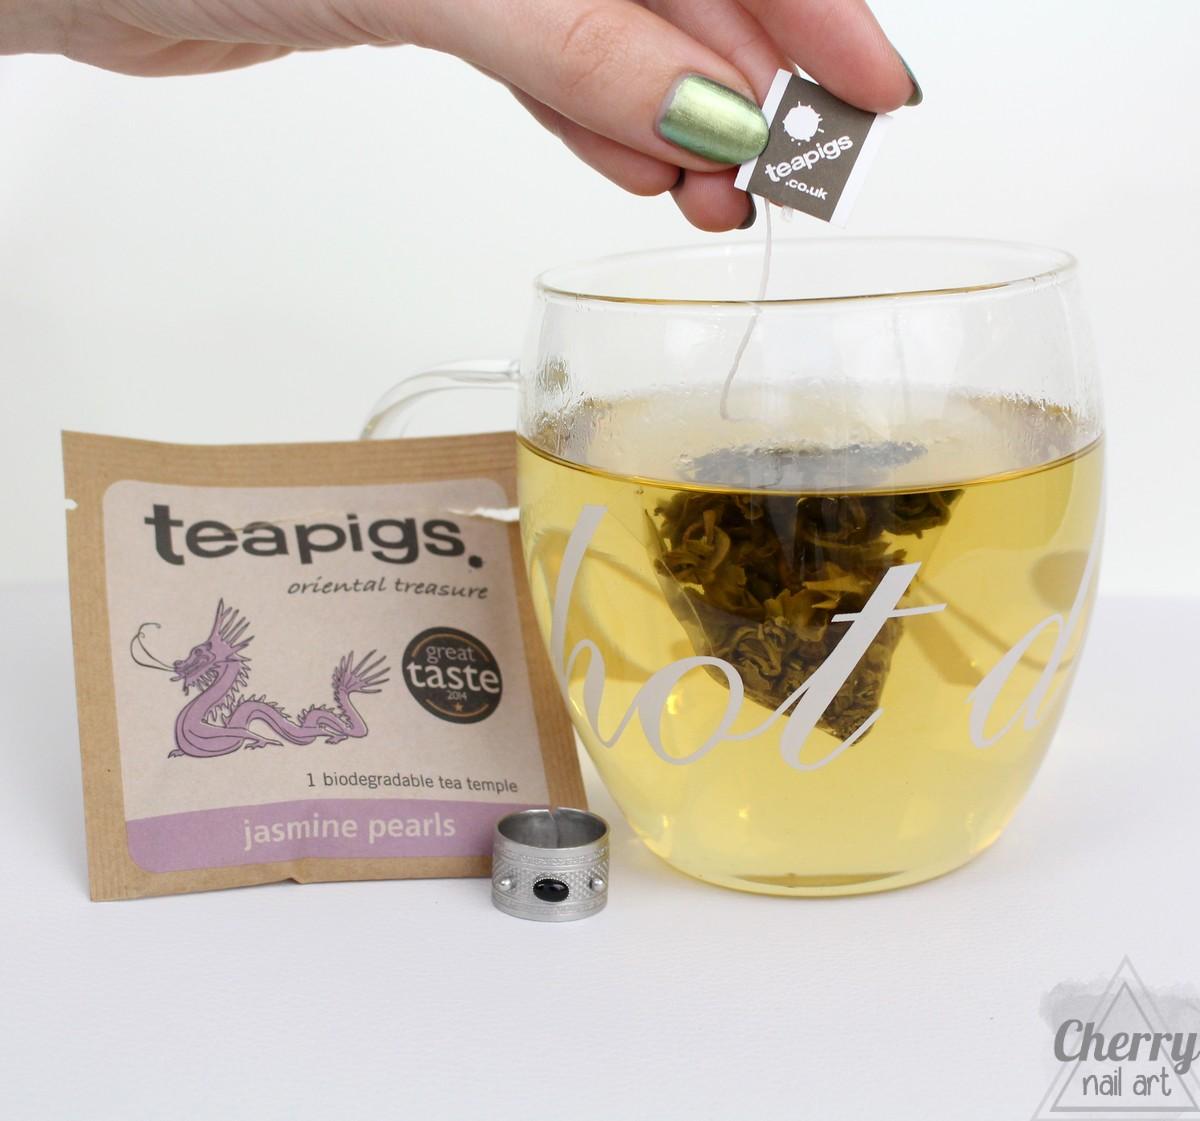 thé-teapigs-box-emma-chloé-janvier-2017-l'atelier-clandestin